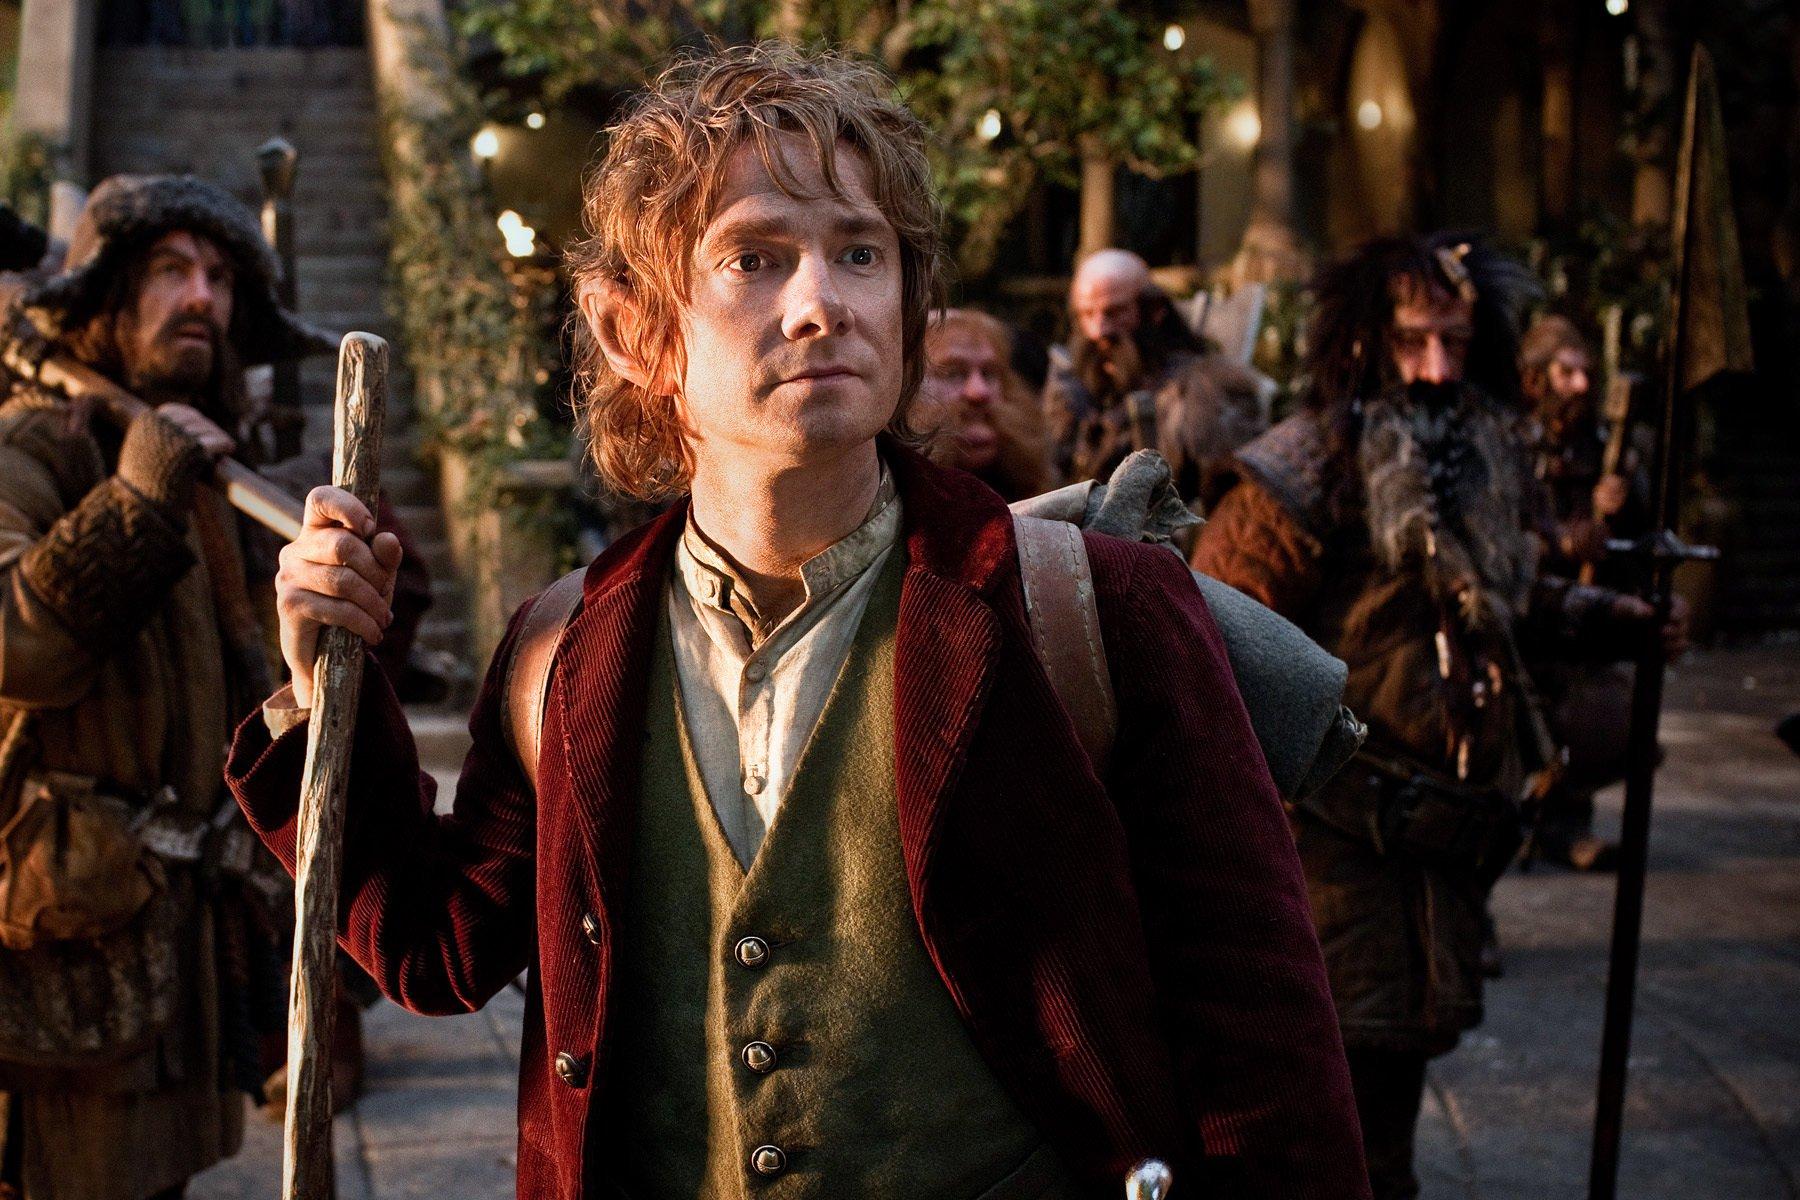 Critical Distance: The Hobbit: An Unexpected Journey